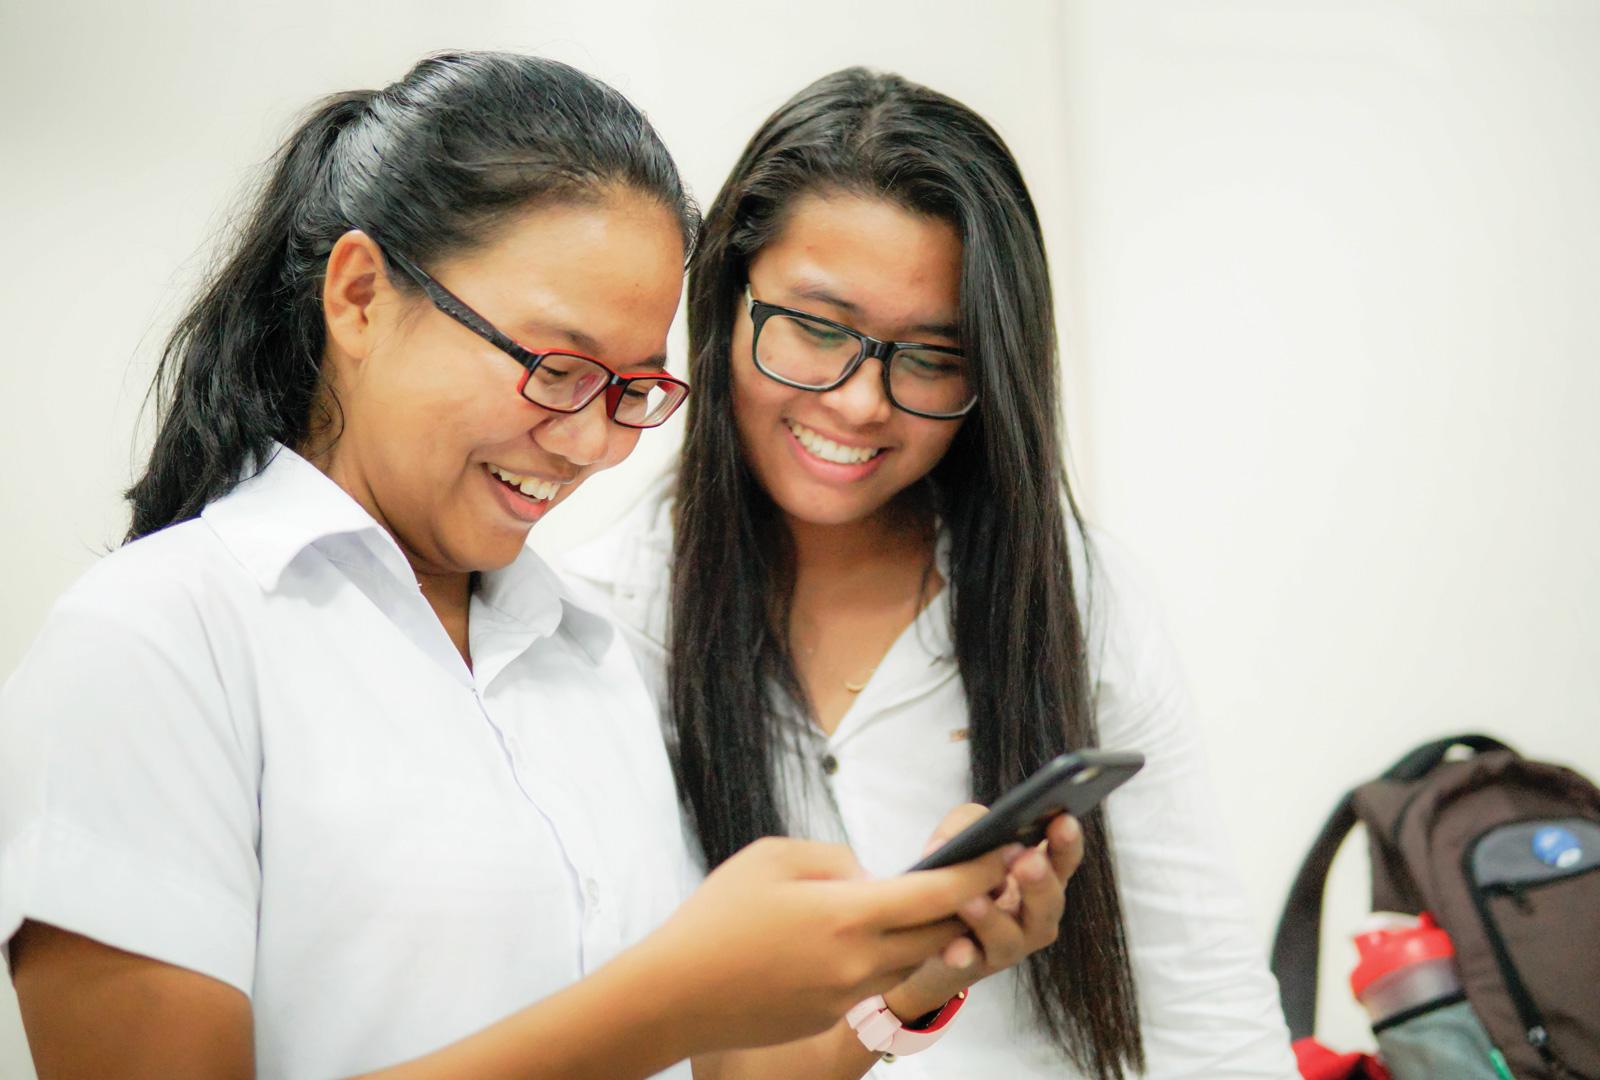 Closing the gap between Cambodian tech talent and demand